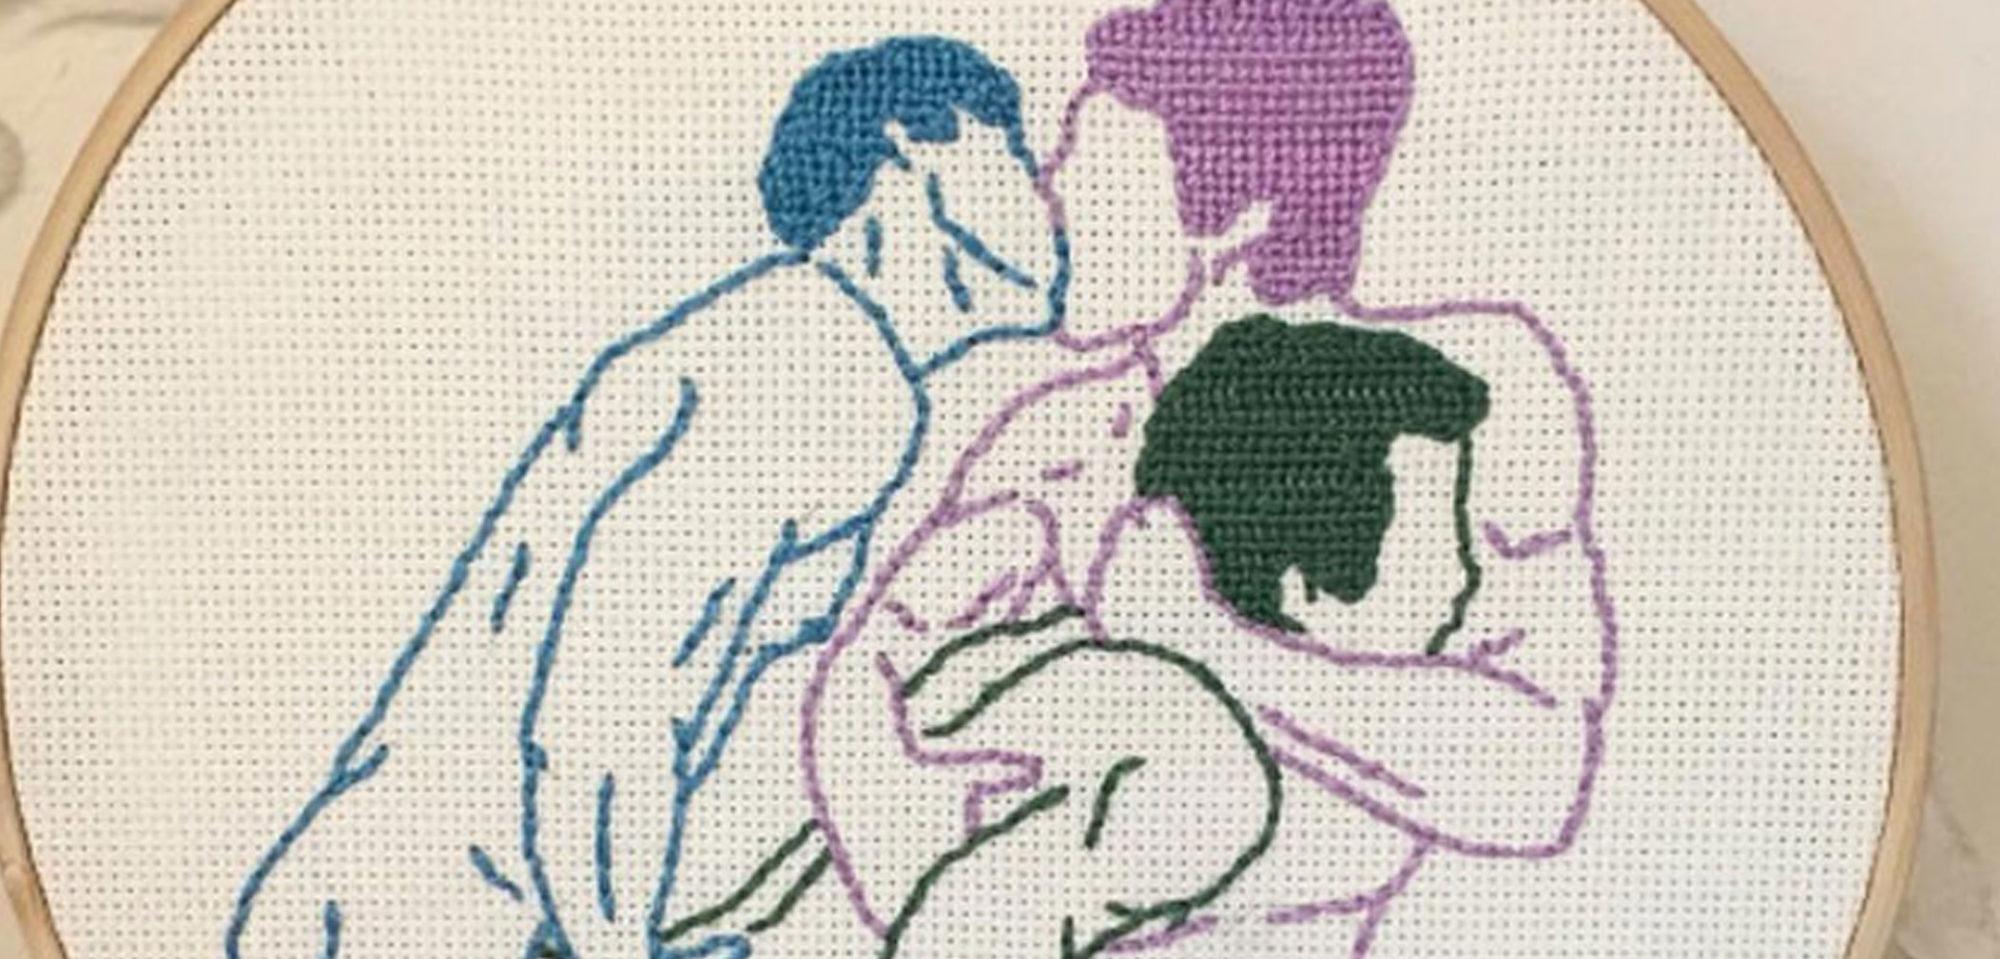 gay needlepoint 22, zachary nutman